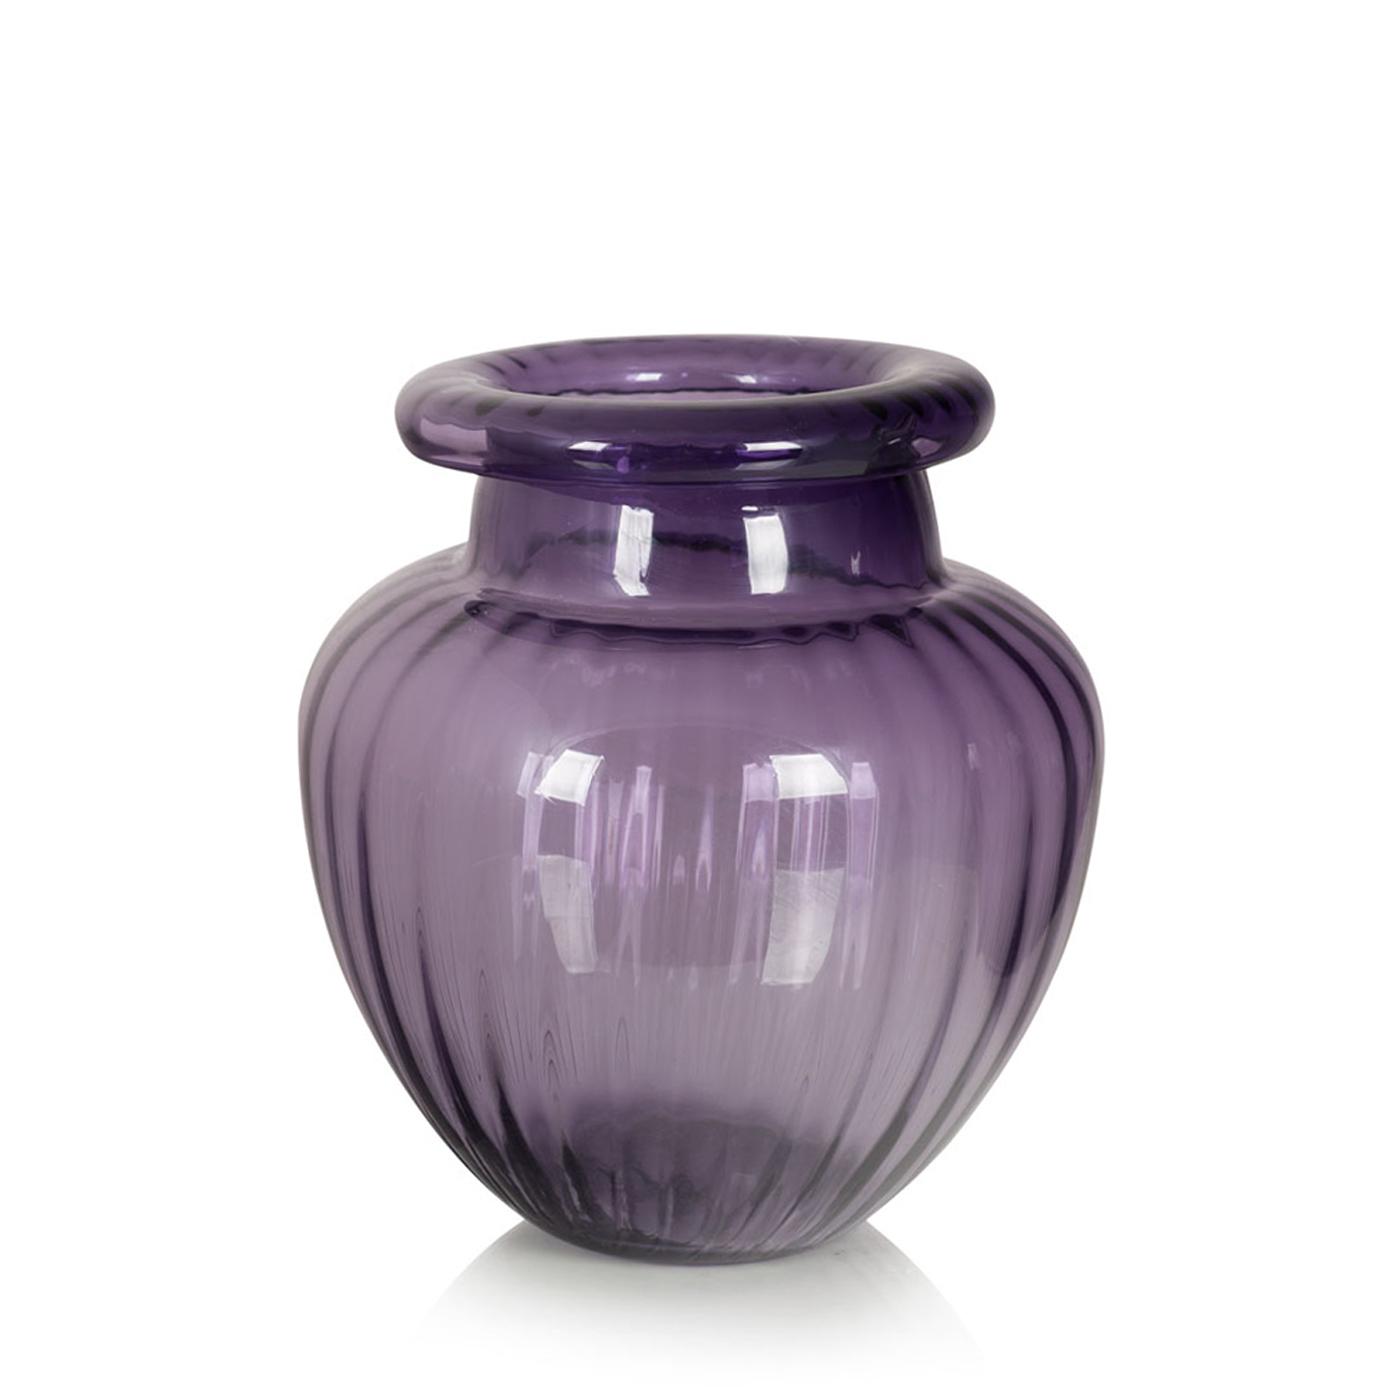 {} Home Philosophy Ваза Brittany Цвет: Лиловый (20х26 см) ваза кружева цветов 26 см